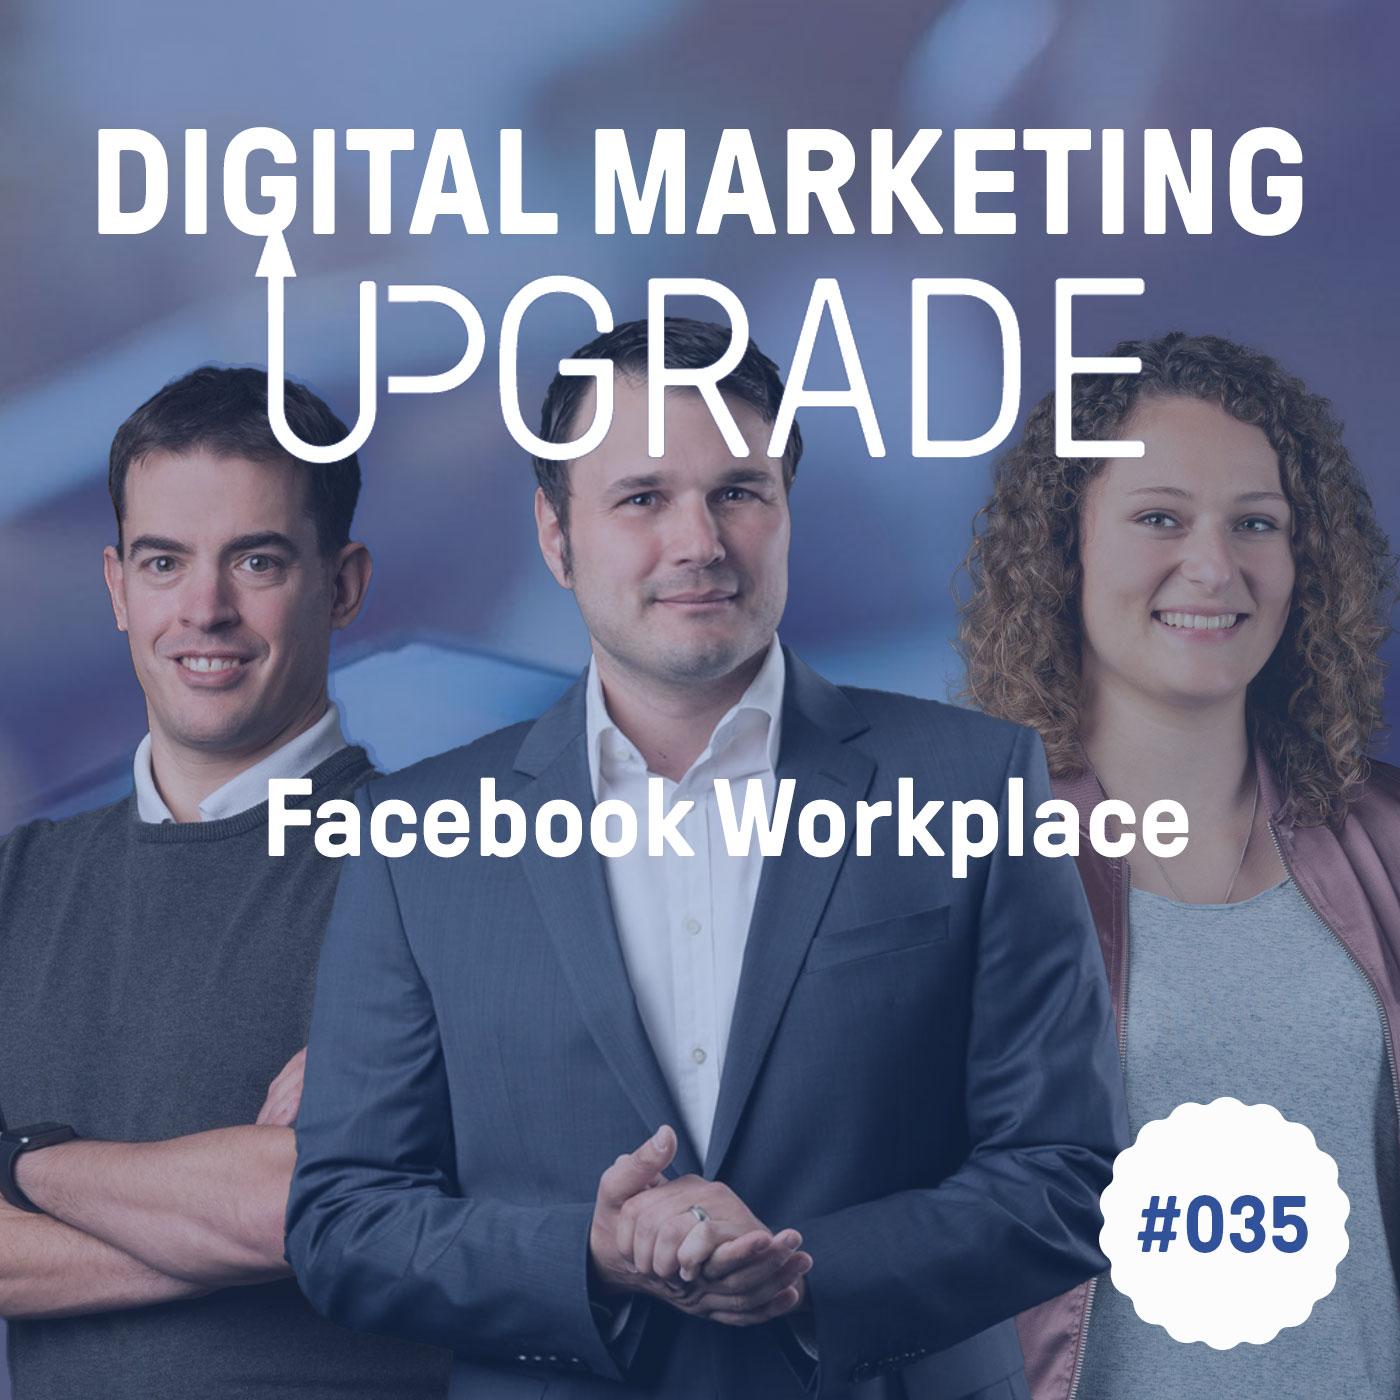 Workplace by Facebook - mit Livia Mosberger und Stefano Lungaretti #035